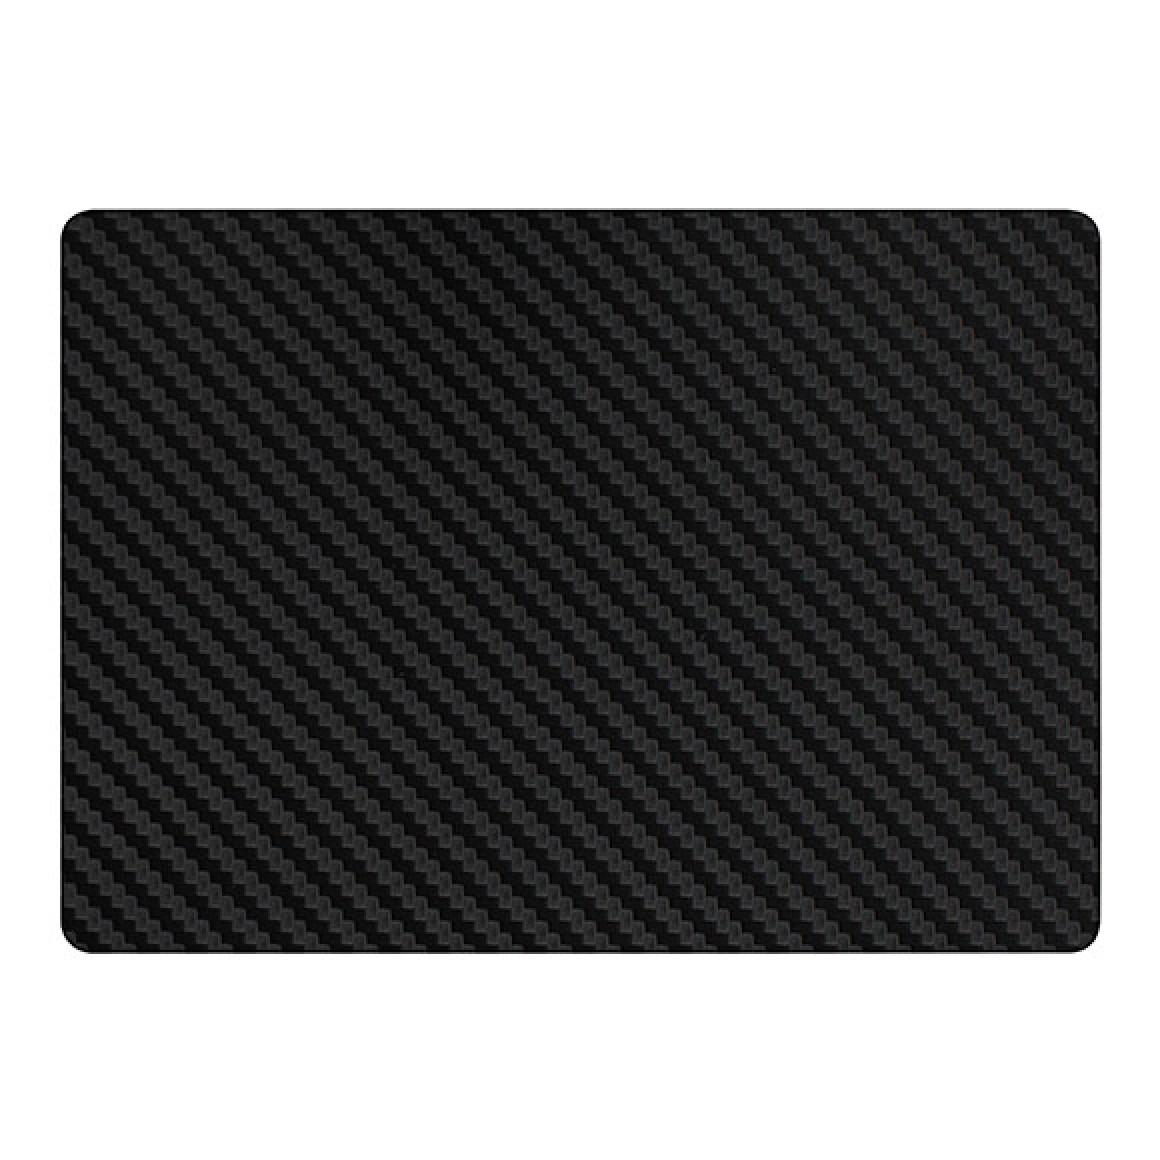 Adesivo Fibra Carbono Para Magic Trackpad 2 2015 A1535